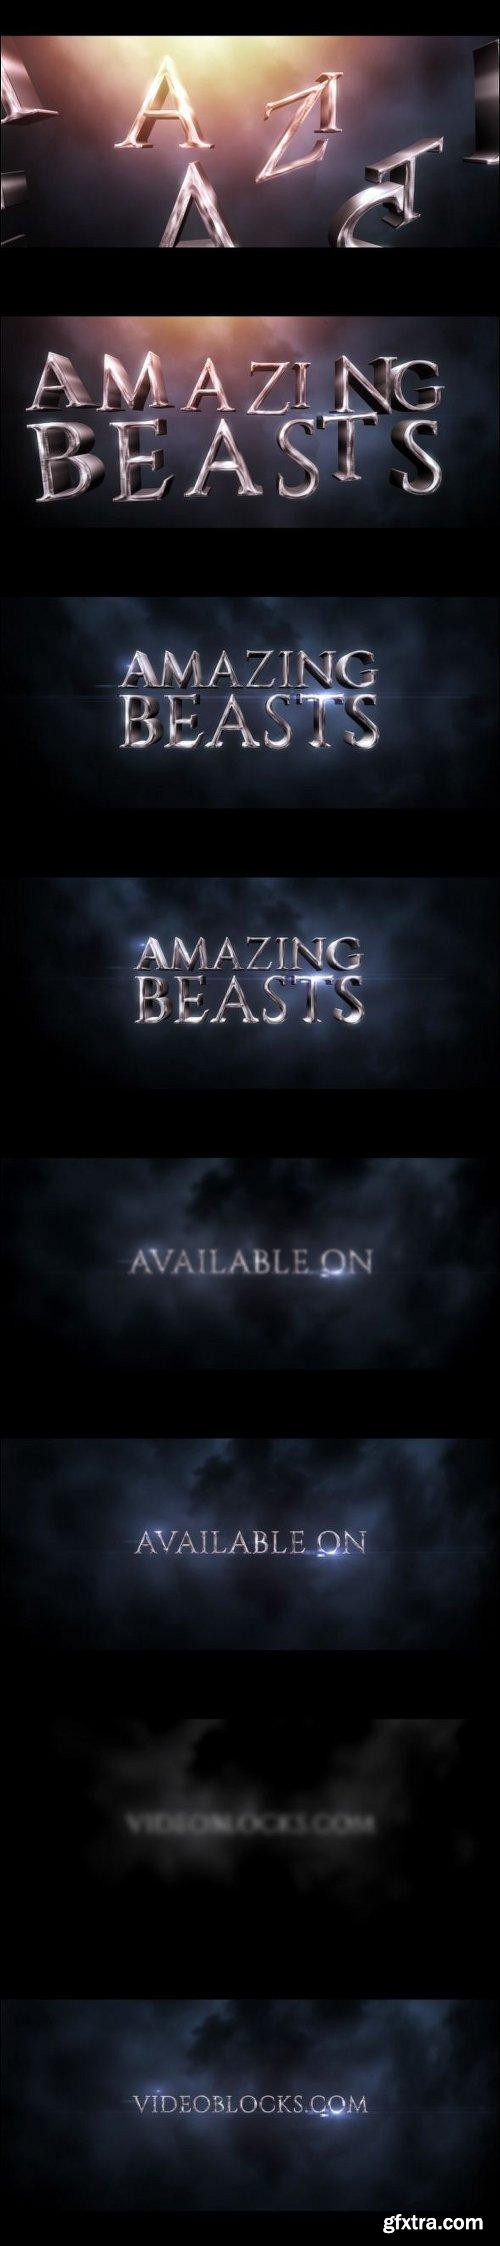 Amazing Beasts Harry Potter Lookalike Titles